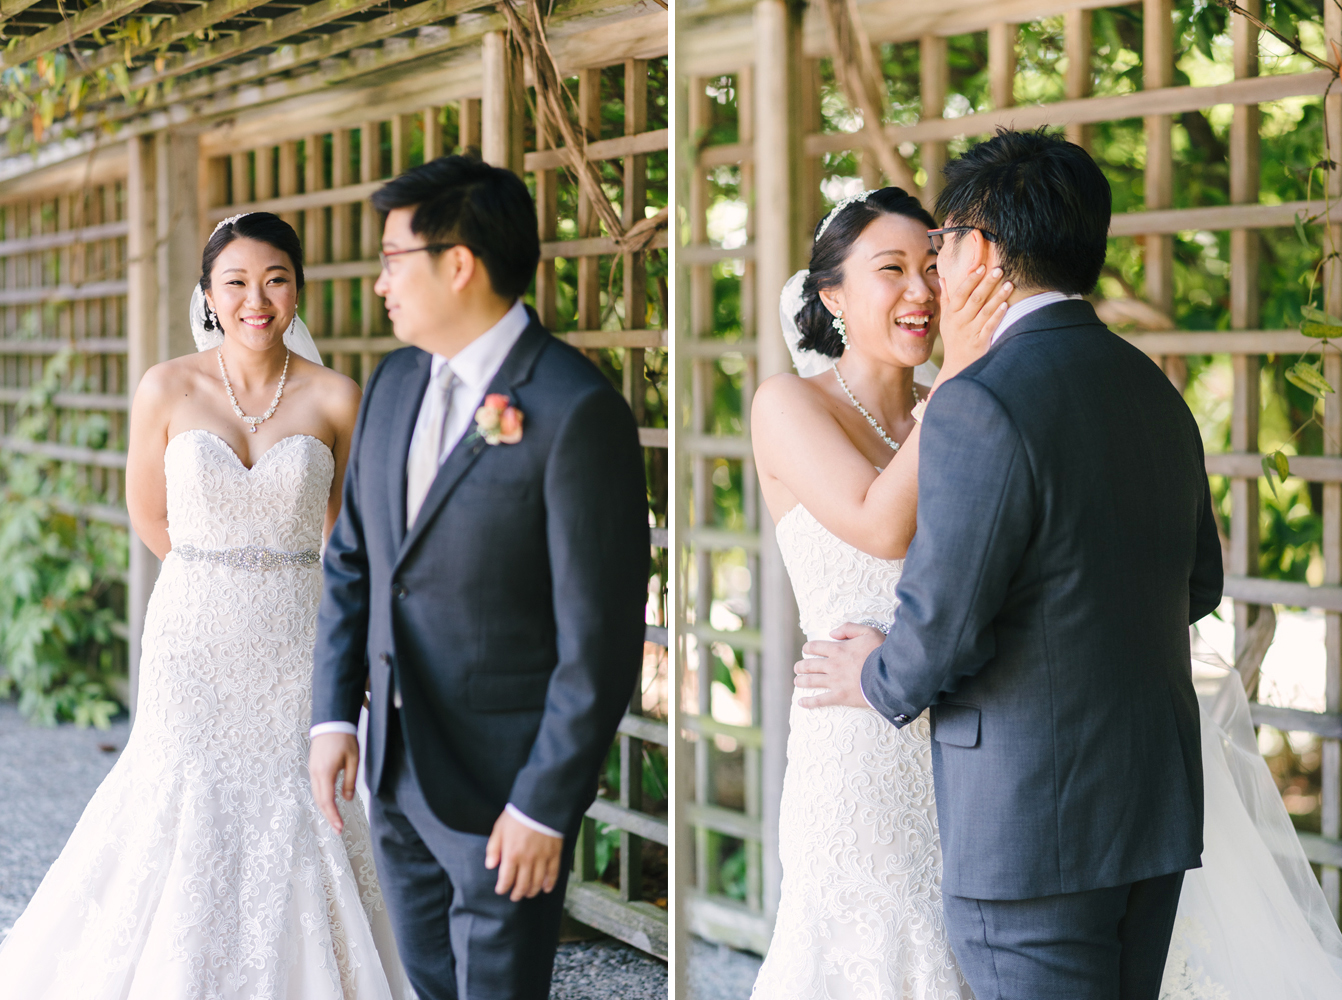 ubc-wedding-10.jpg